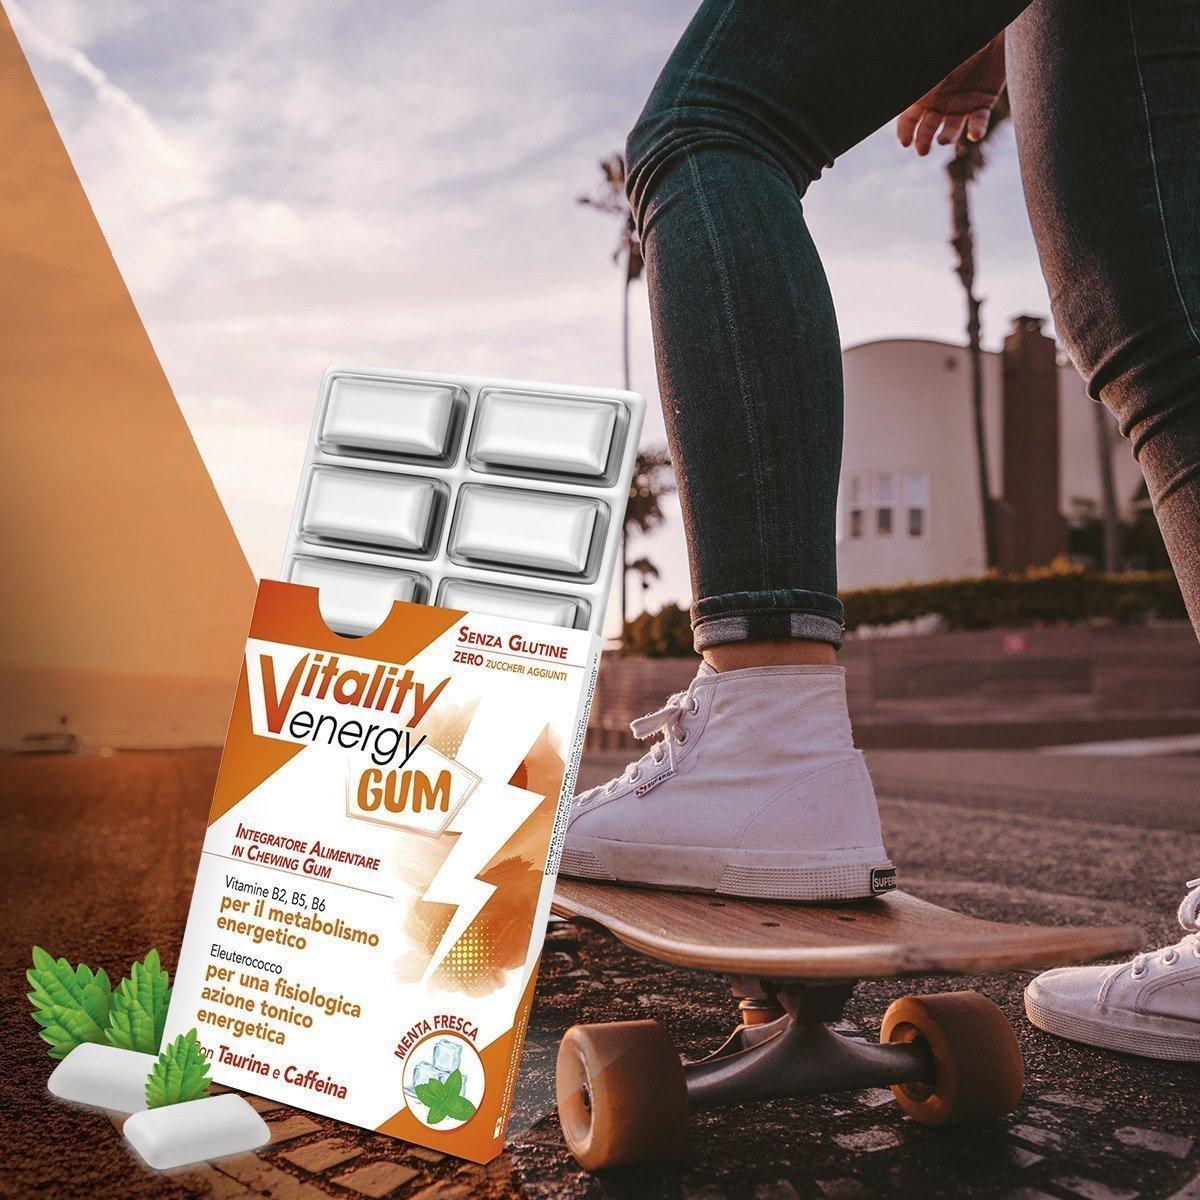 Vitality Energy Gum